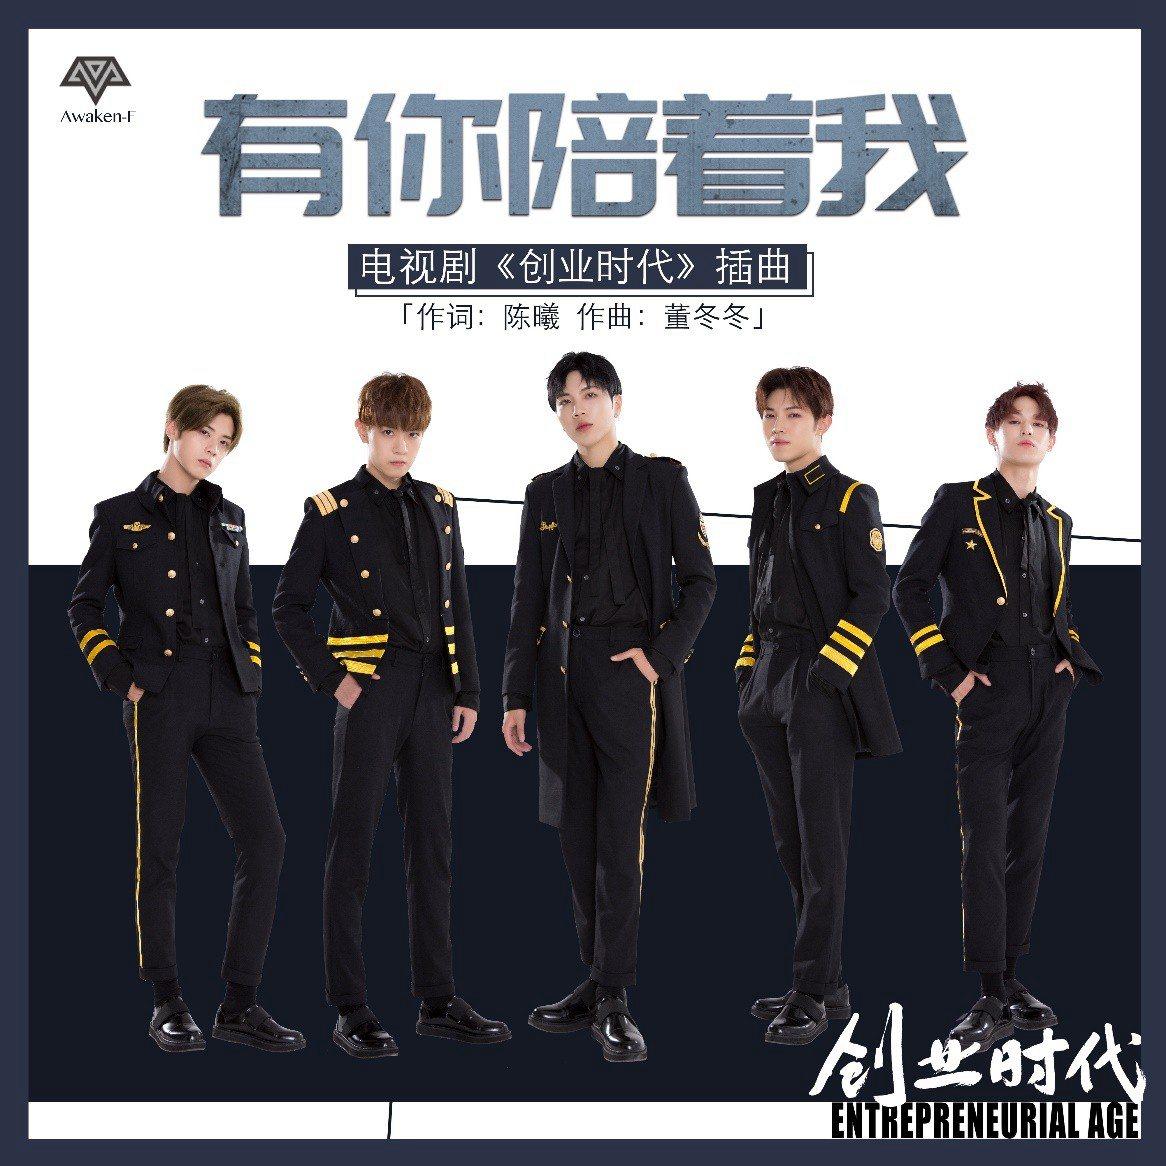 Awaken-F献唱第一首OST 《创业时代》原声音乐惊喜无限